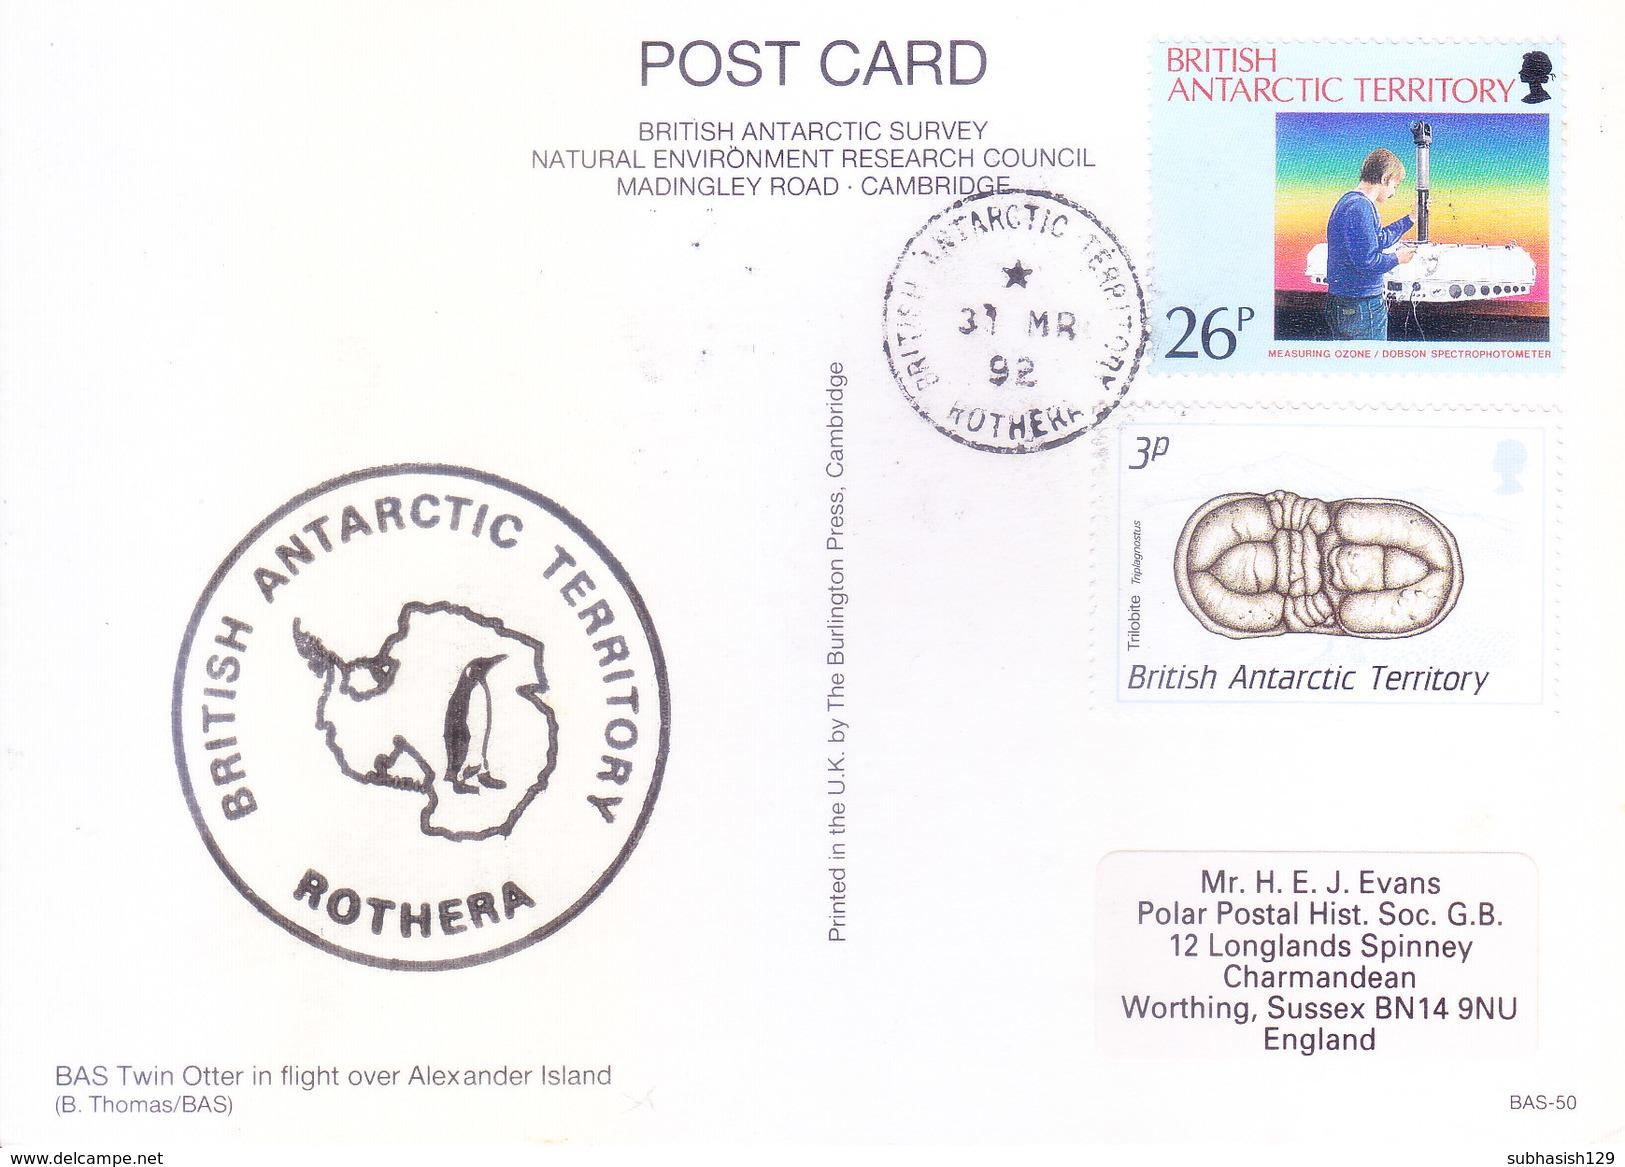 BRITISH ANTARCTIC TERRITORY - EXPEDITION POST CARD, 1992 - BRITISH ANTARCTIC TERRITORY, ROTHERA - Covers & Documents